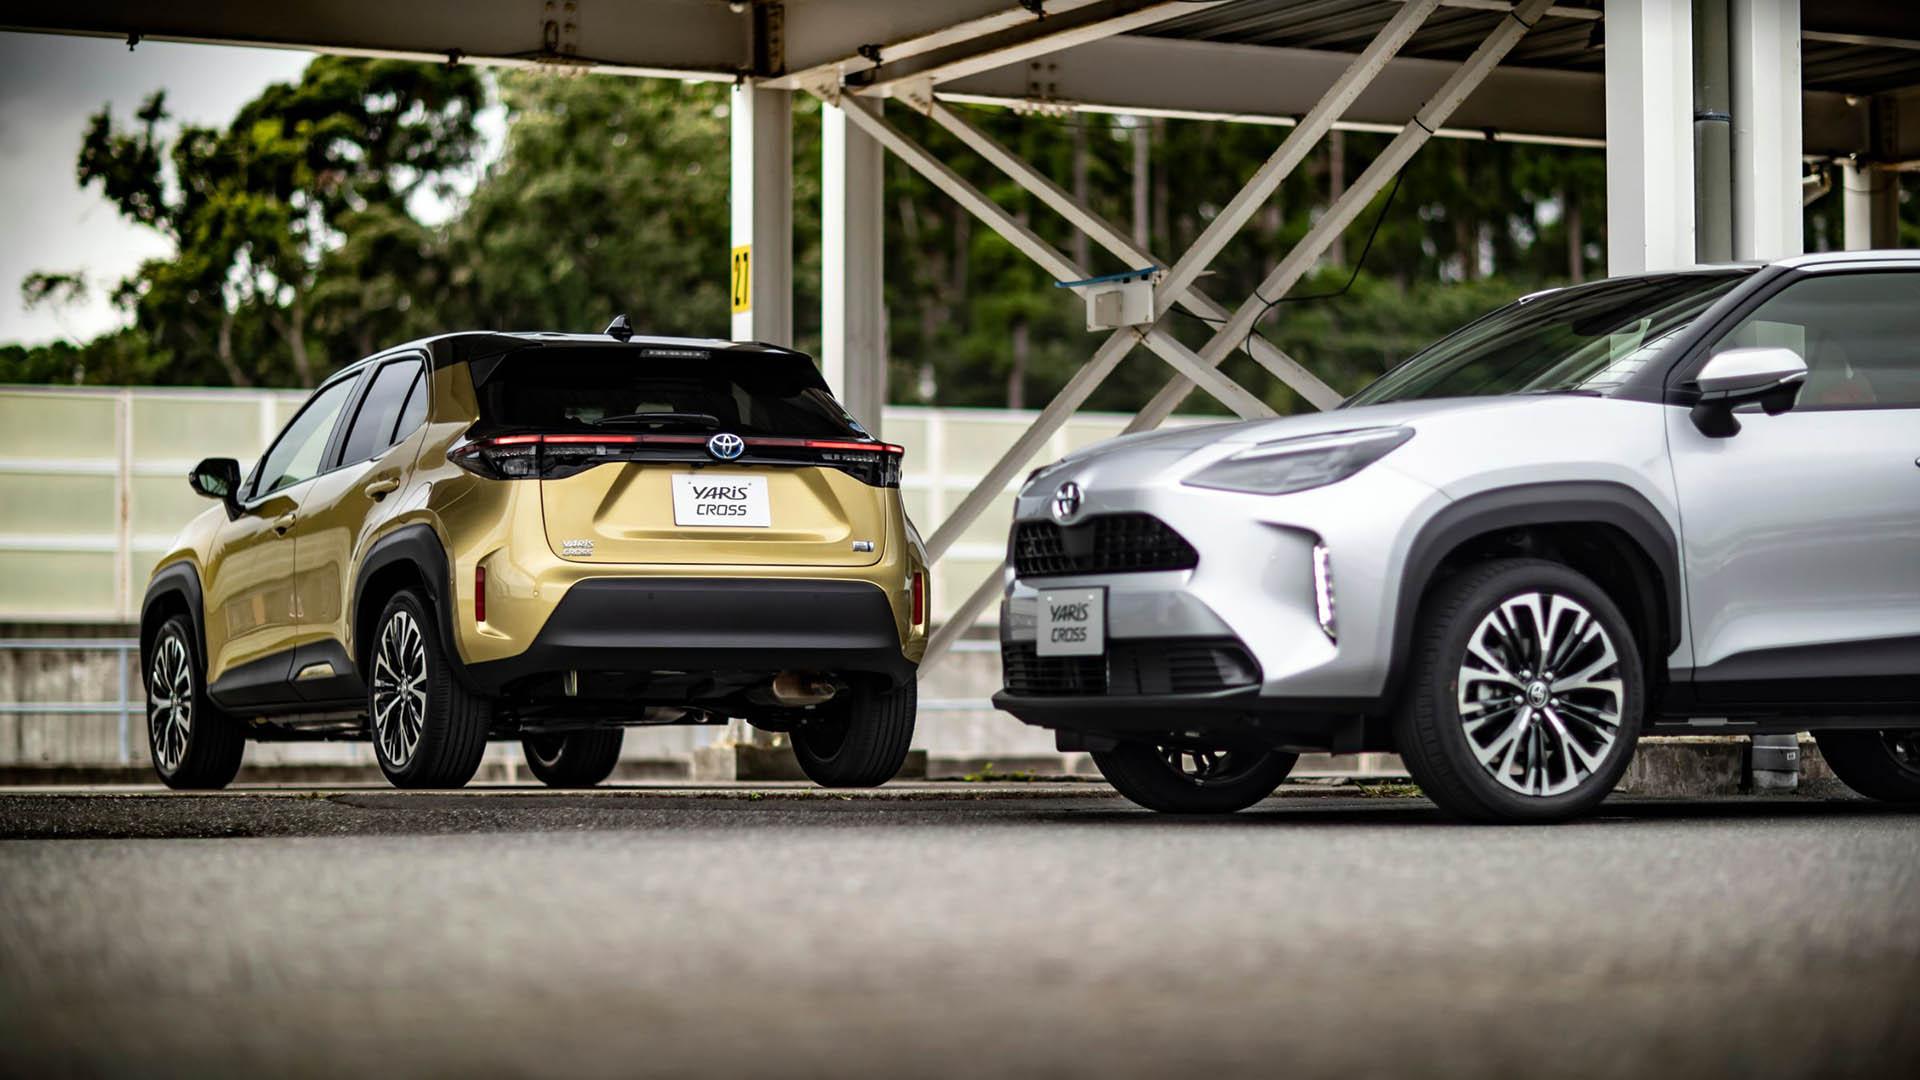 Toyota: Ανάρπαστο και δυσεύρετο το Yaris Cross πριν καν κυκλοφορήσει!